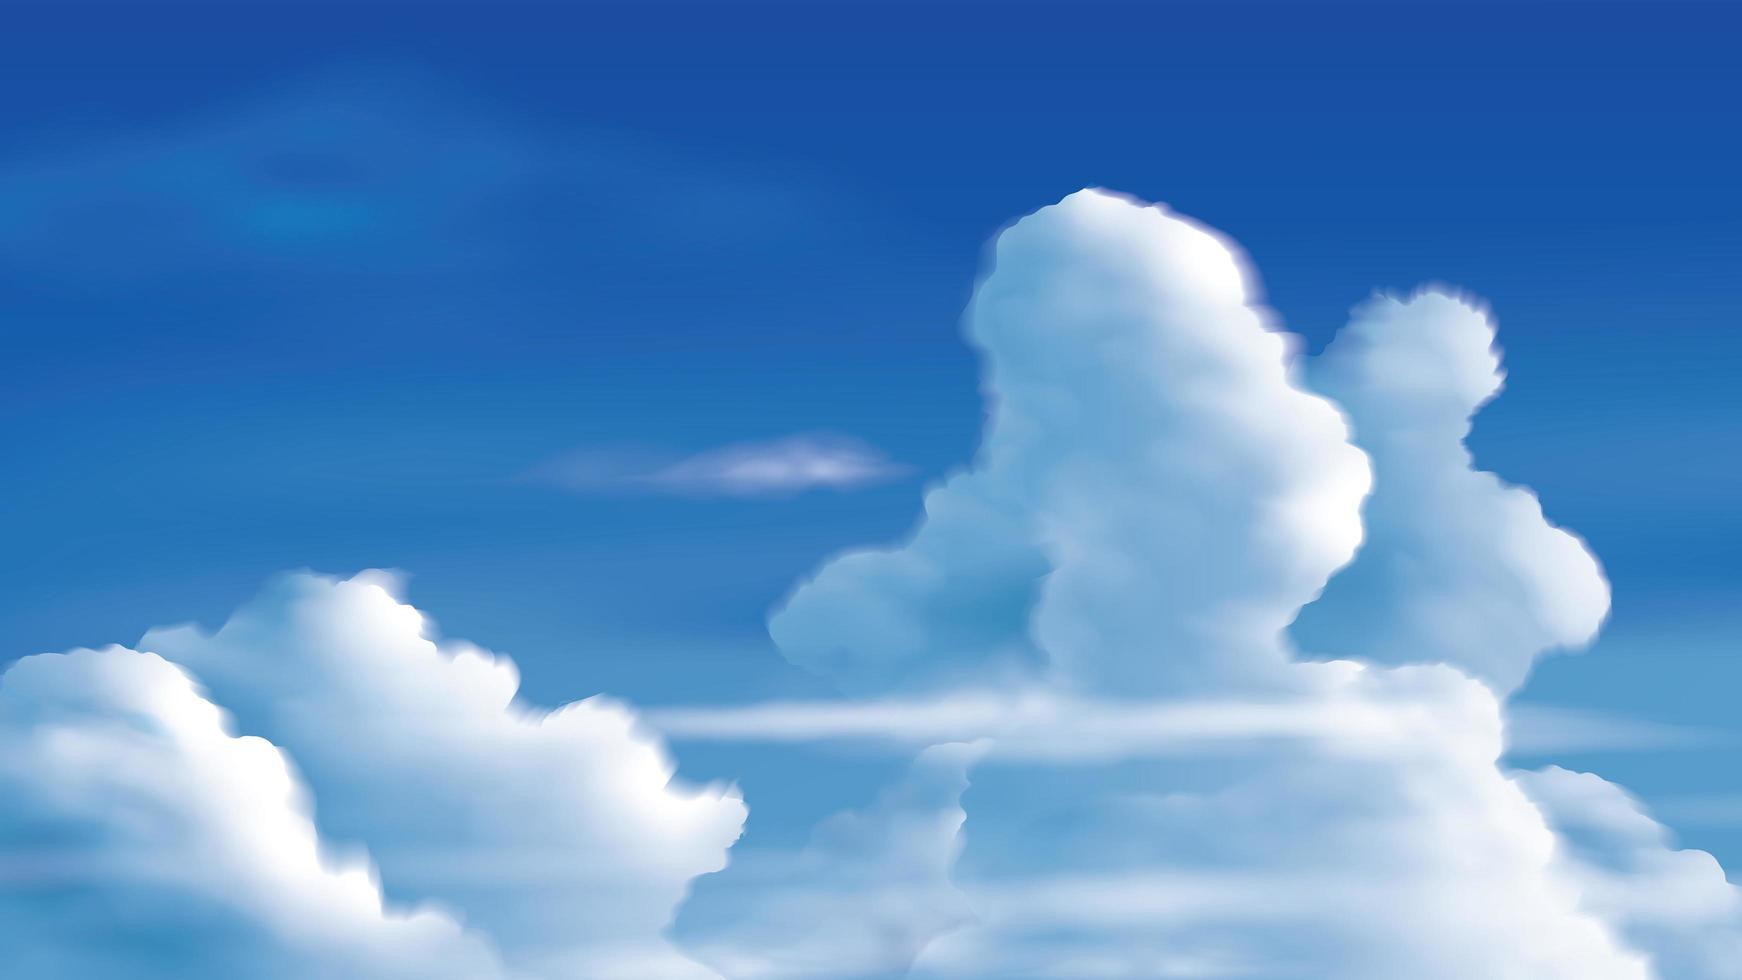 cumulonembi sul cielo azzurro vettore